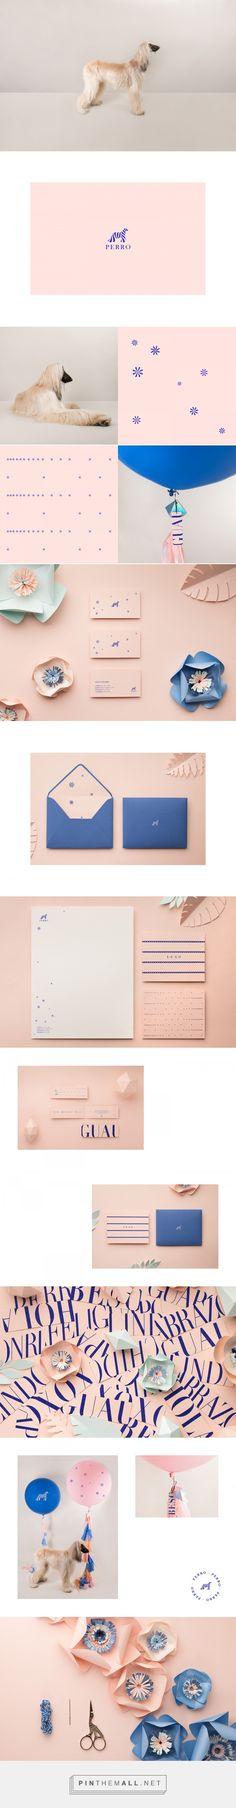 Perro Branding by Copo Design | Fivestar Branding – Design and Branding Agency & Inspiration Gallery